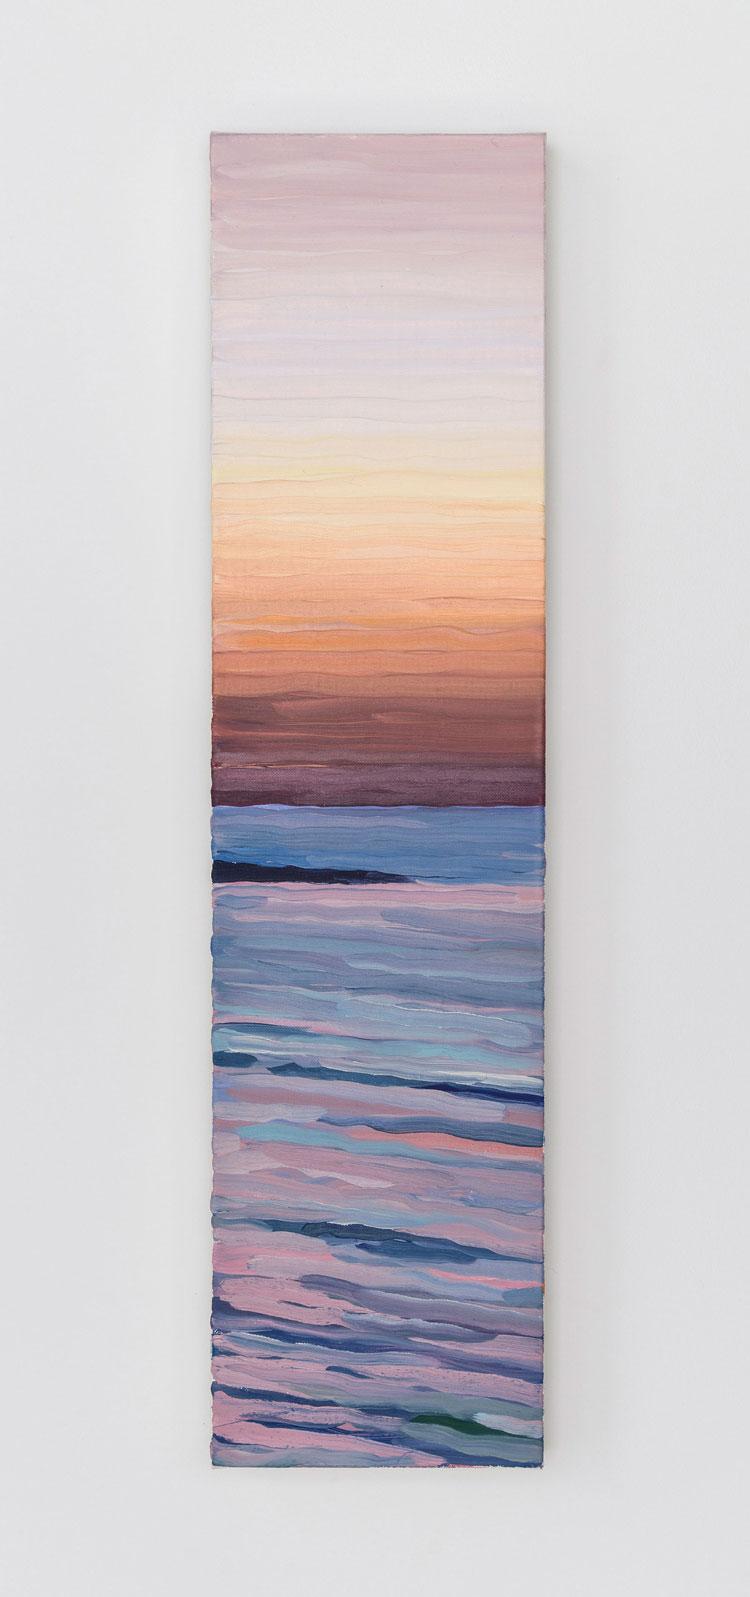 CD142-Impression-Sunset-detail-6.jpg